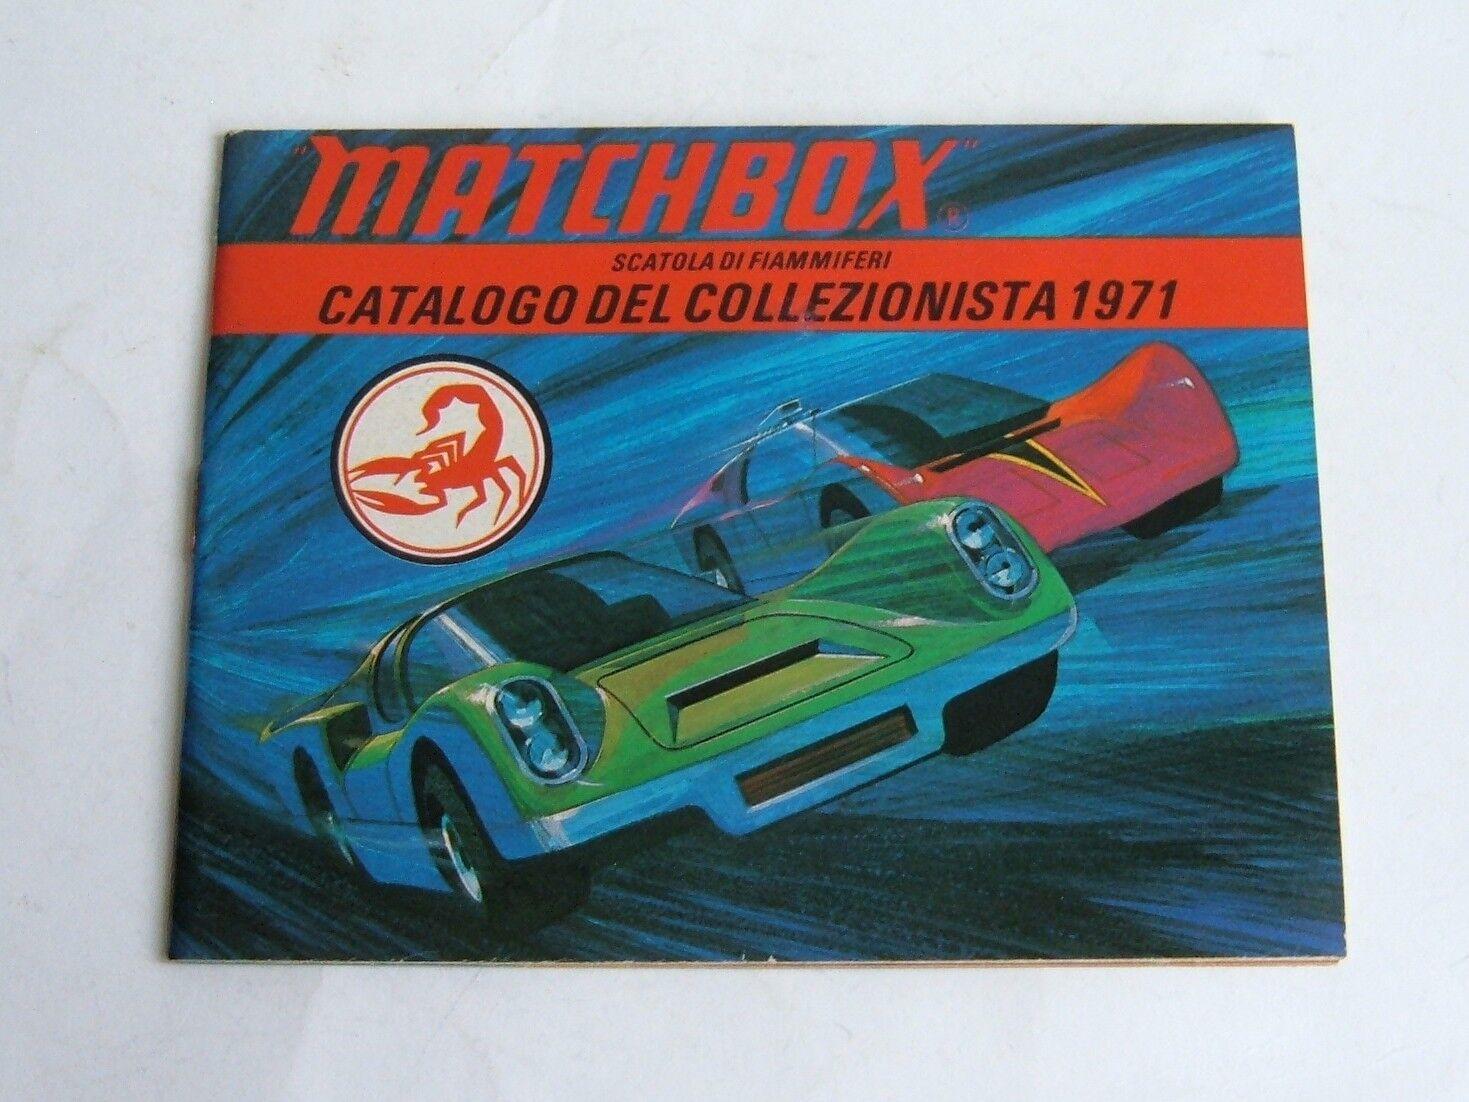 Very Rare Italian Matchbox Toys Catalogue, Dated 1971, - Superb Mint.